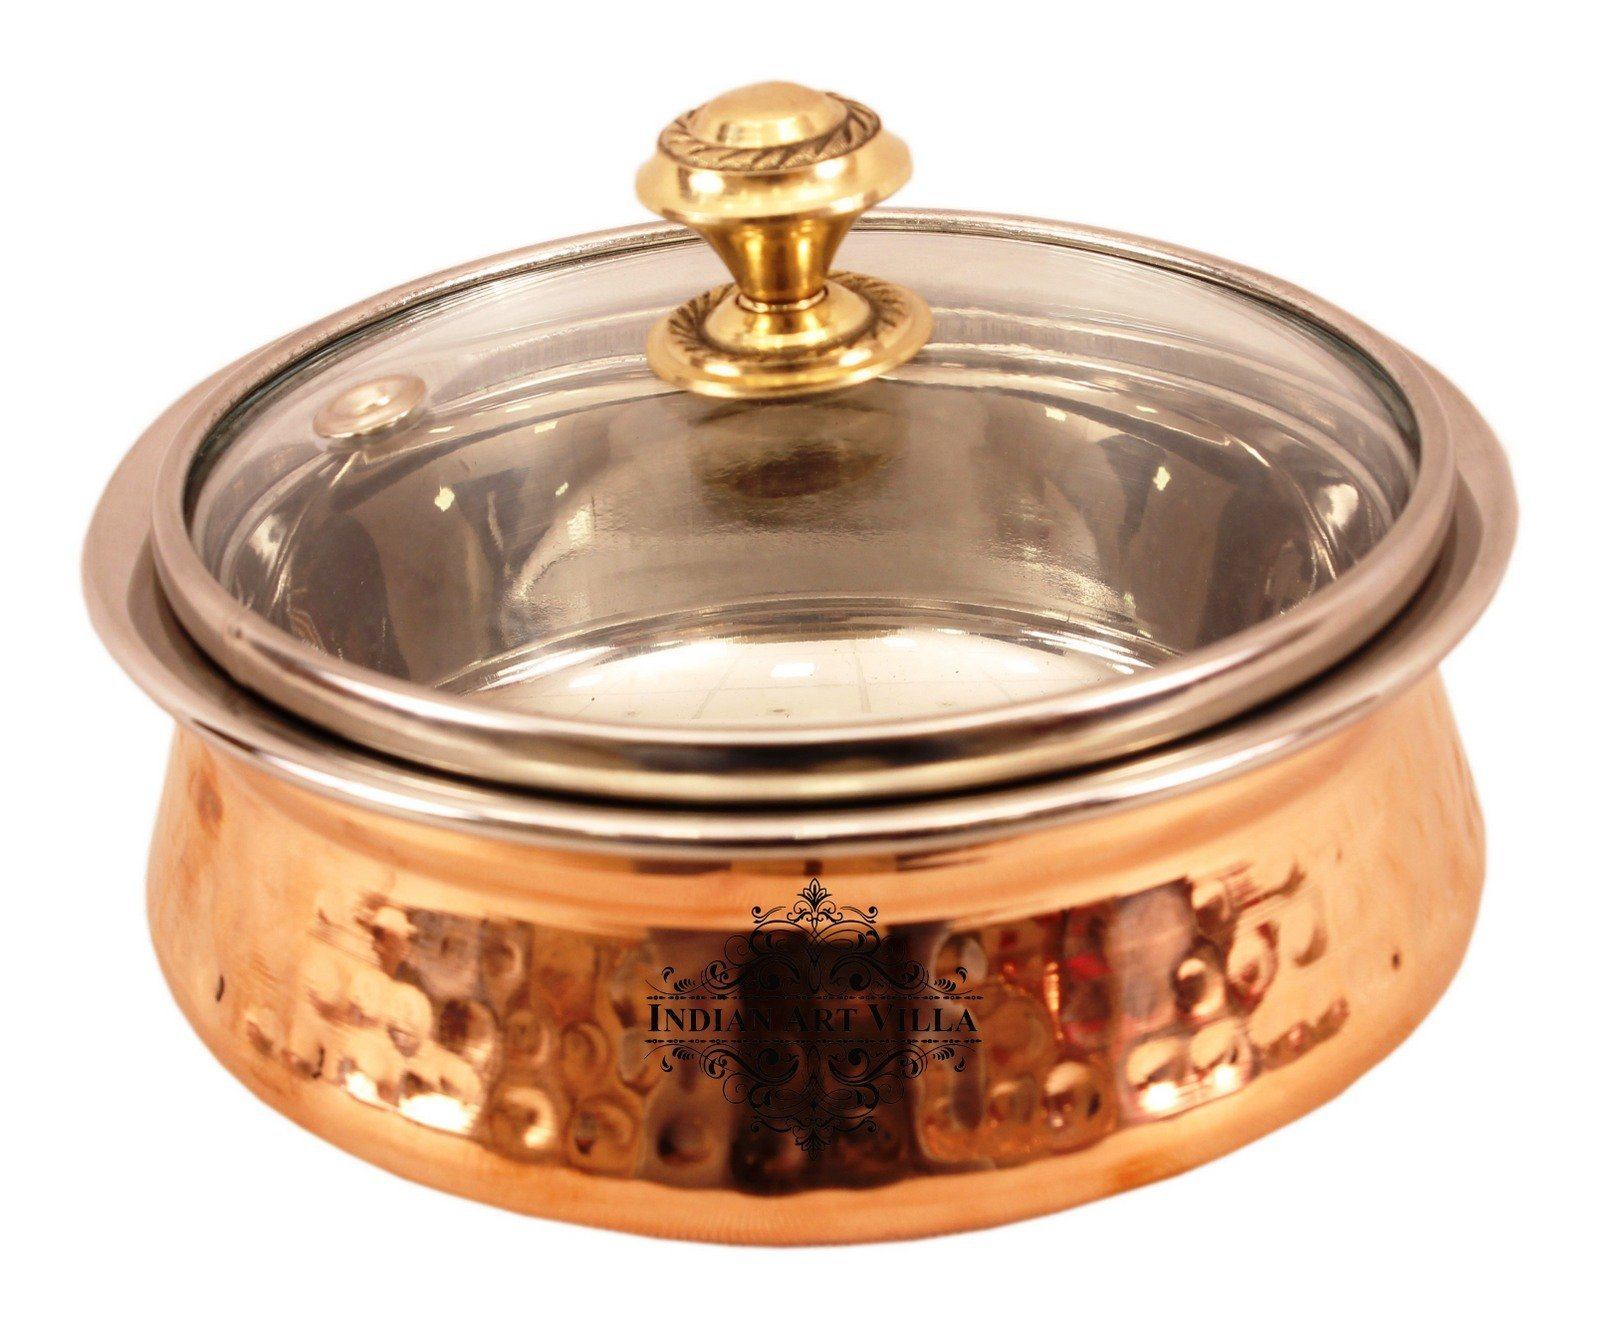 IndianArtVilla Hammered Steel Copper Handi Bowl with Glass Lid & Brass Knob, Serveware, 14 OZ